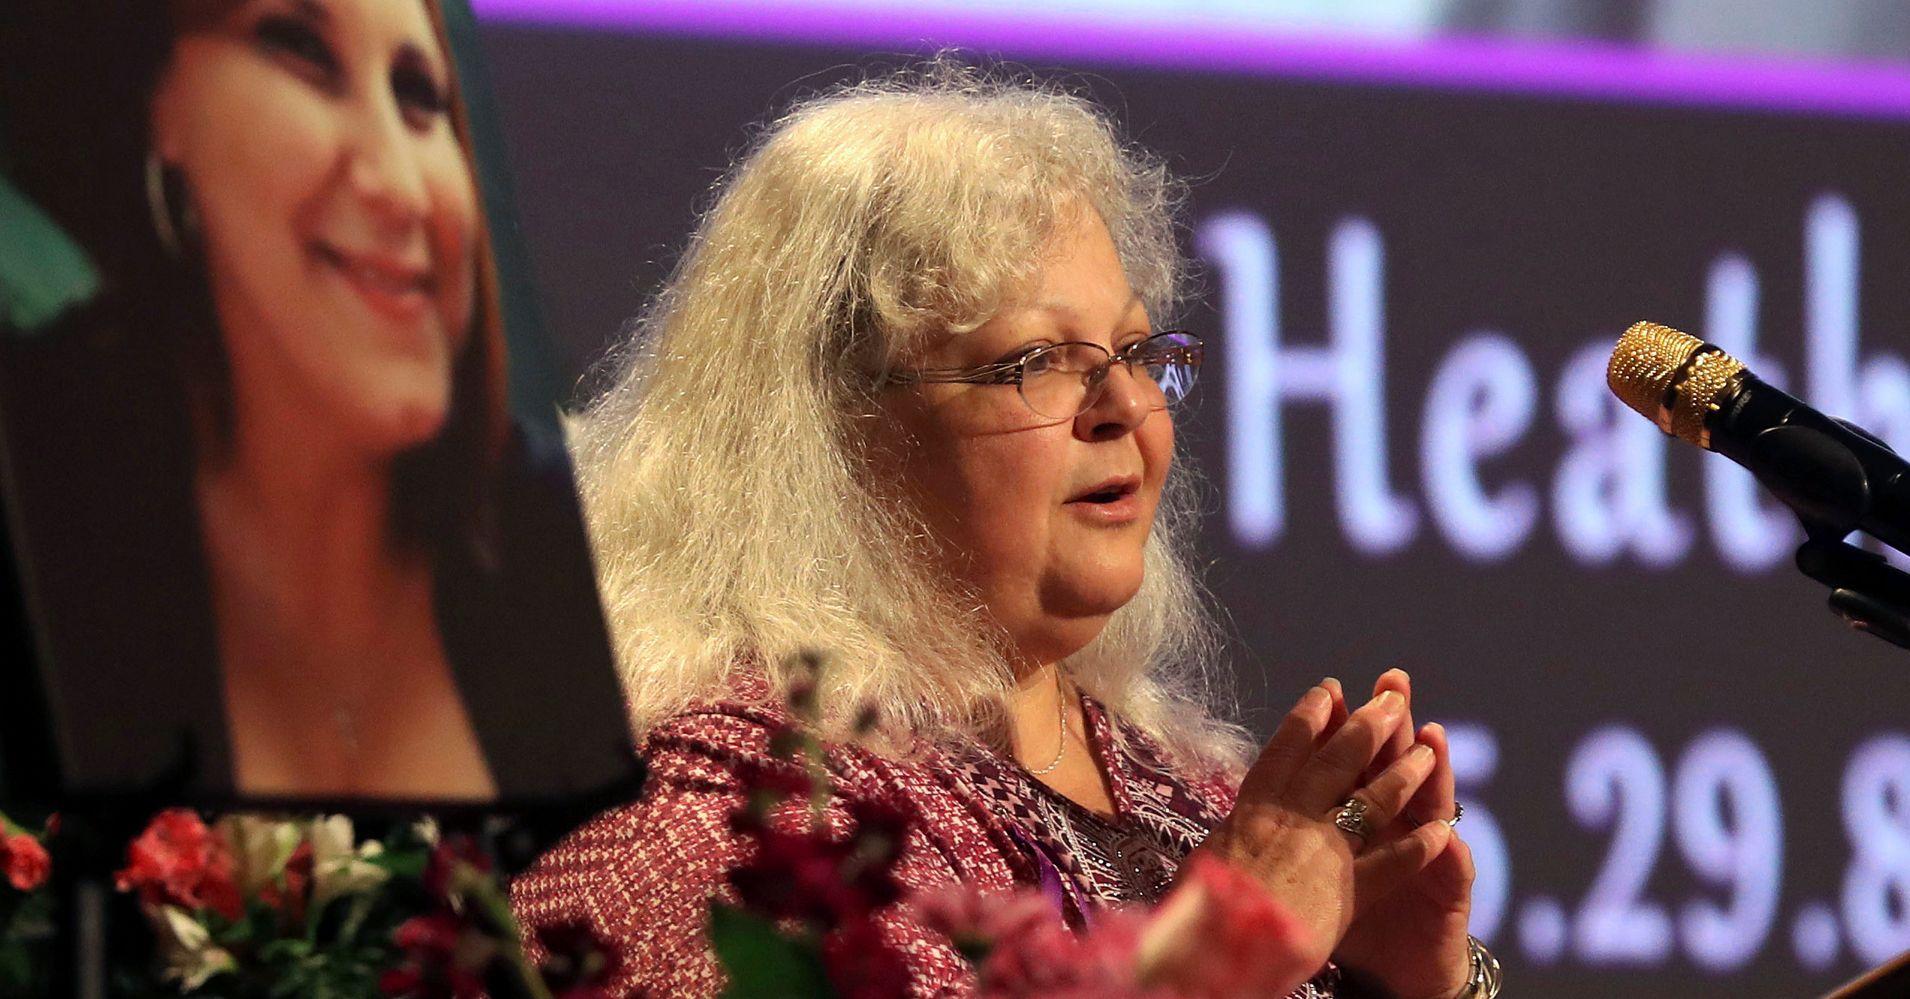 Susan Bro, Heather Heyer's Mom, Won't Speak To Donald Trump